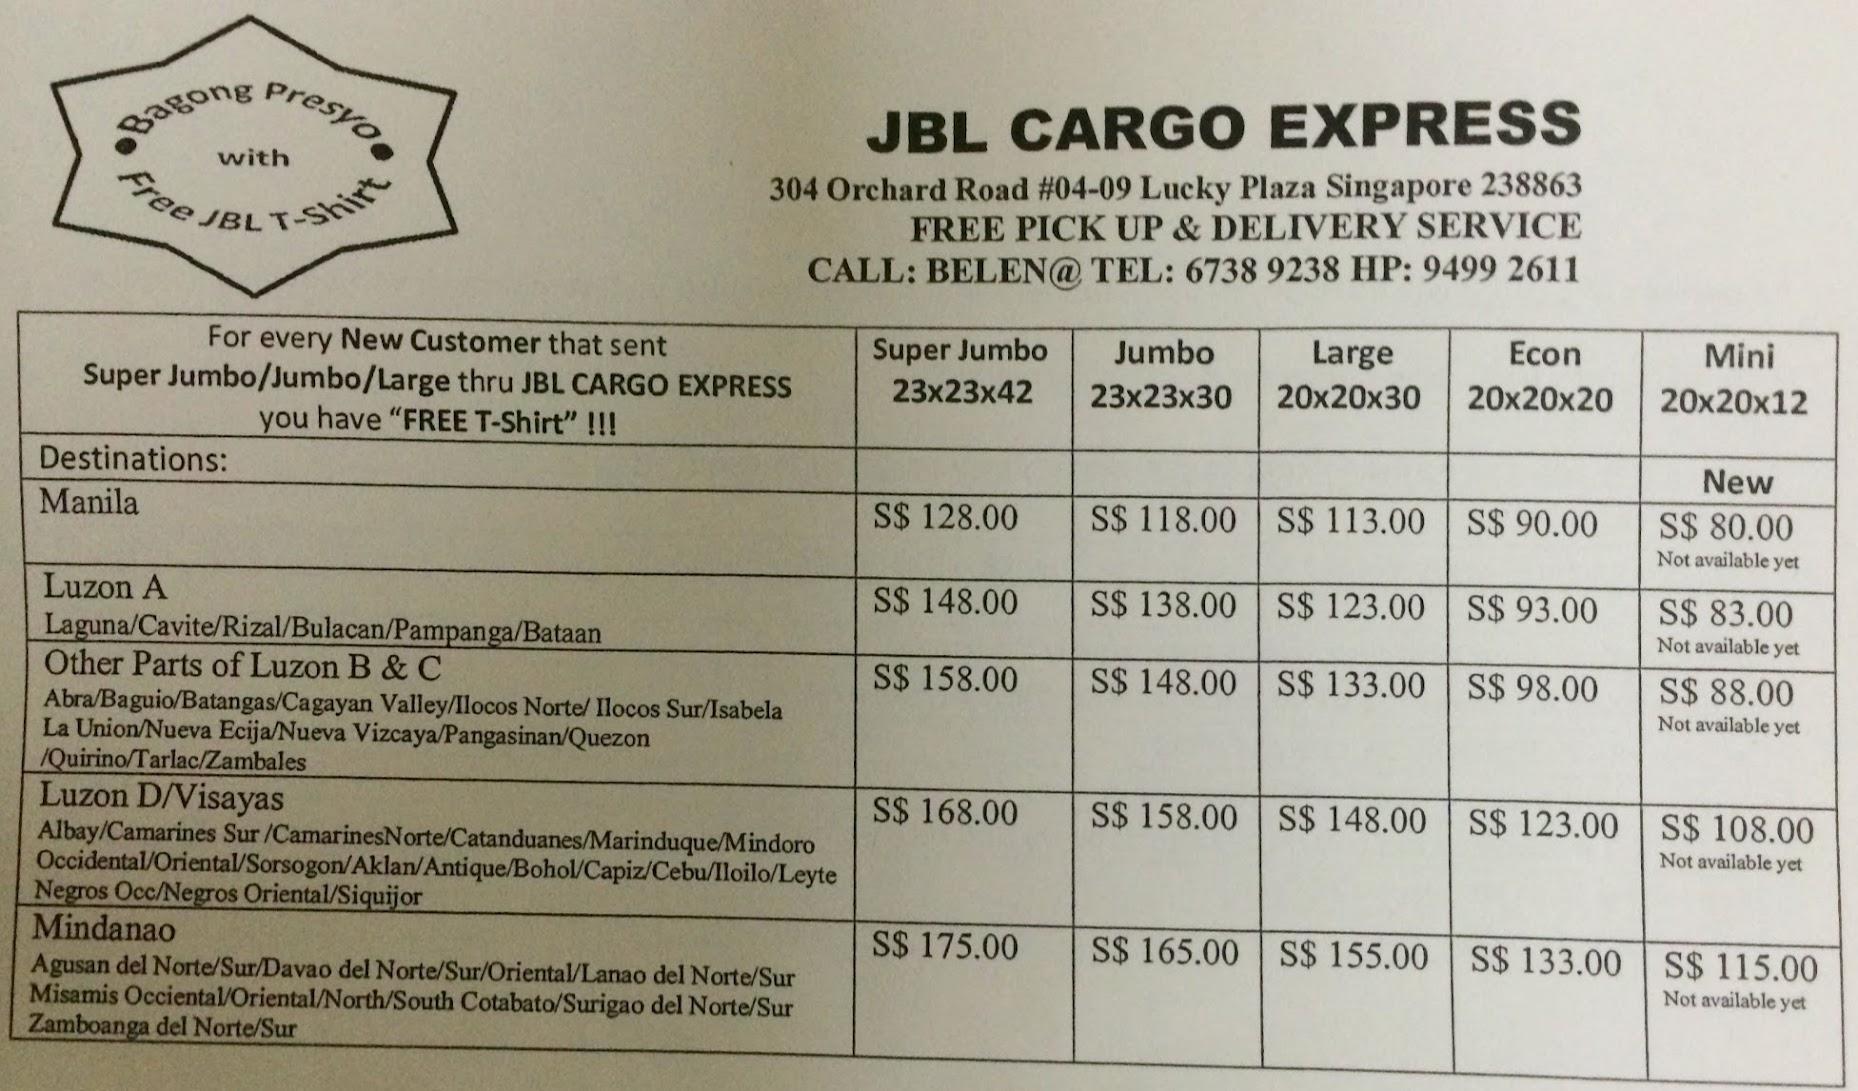 jbl cargo express